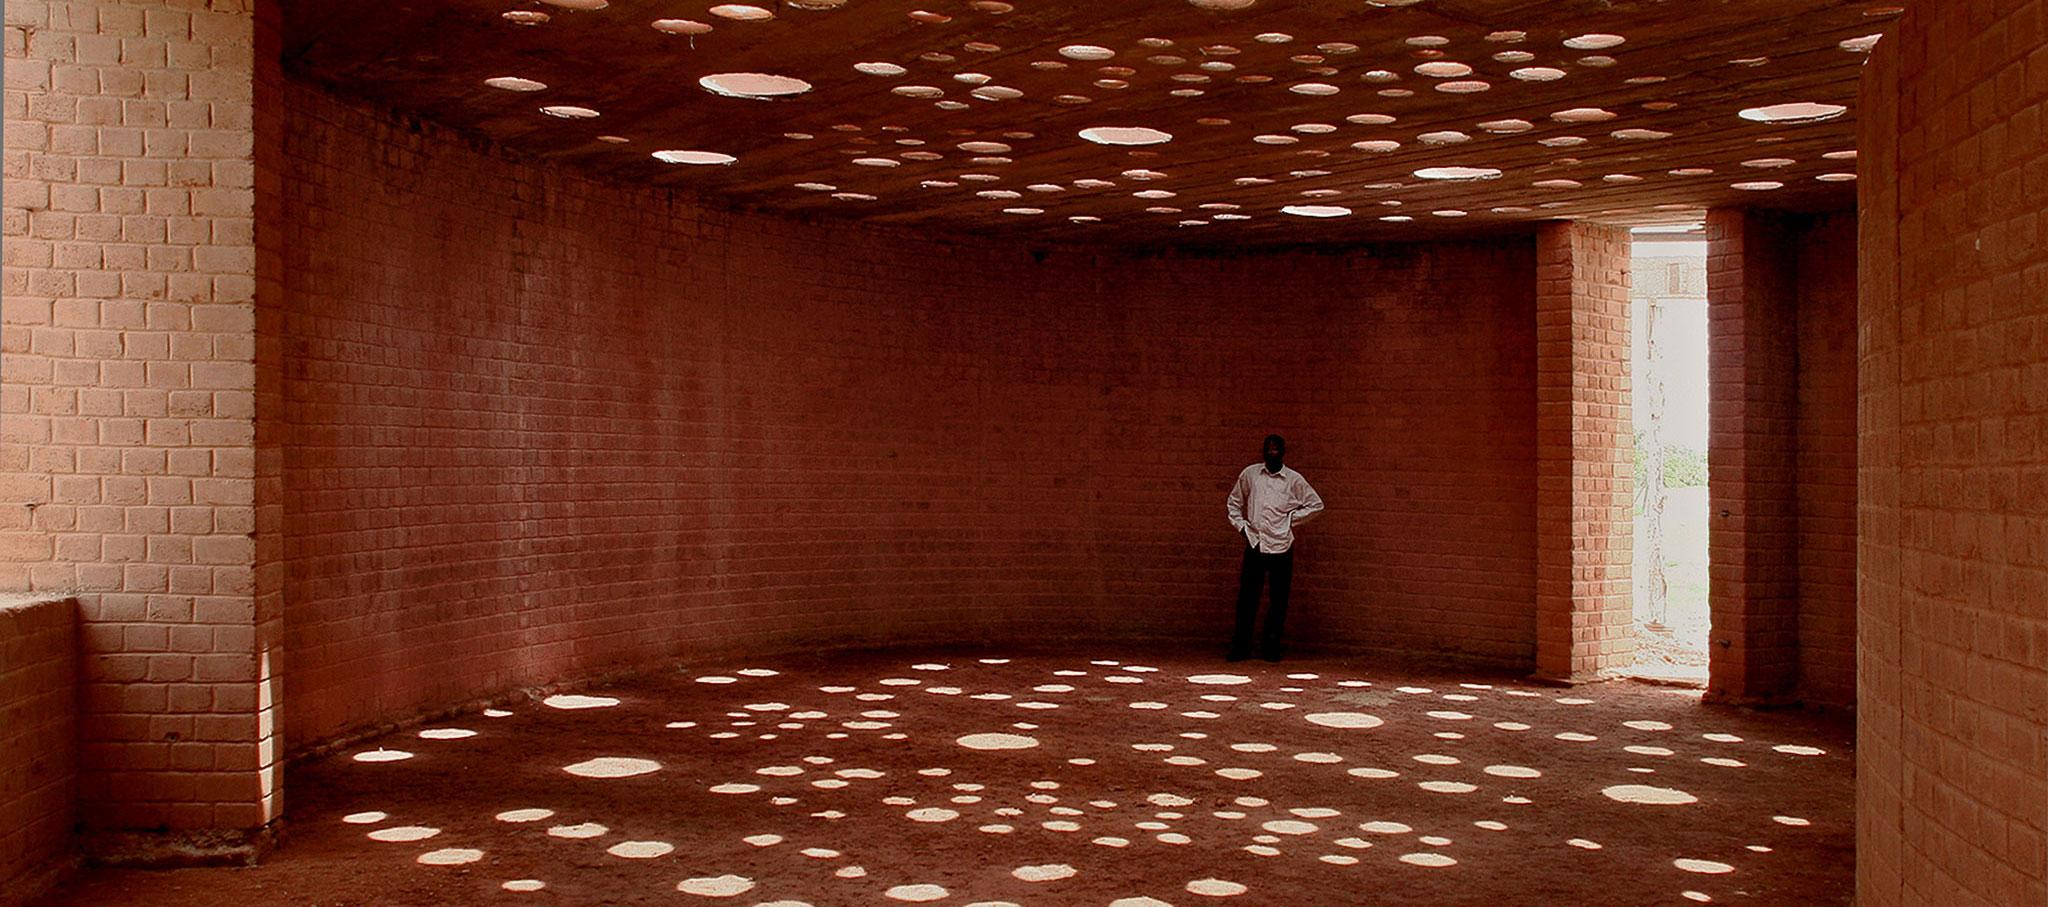 Gando Primary School Library by Kéré Architecture. Photograph by Francis Kéré